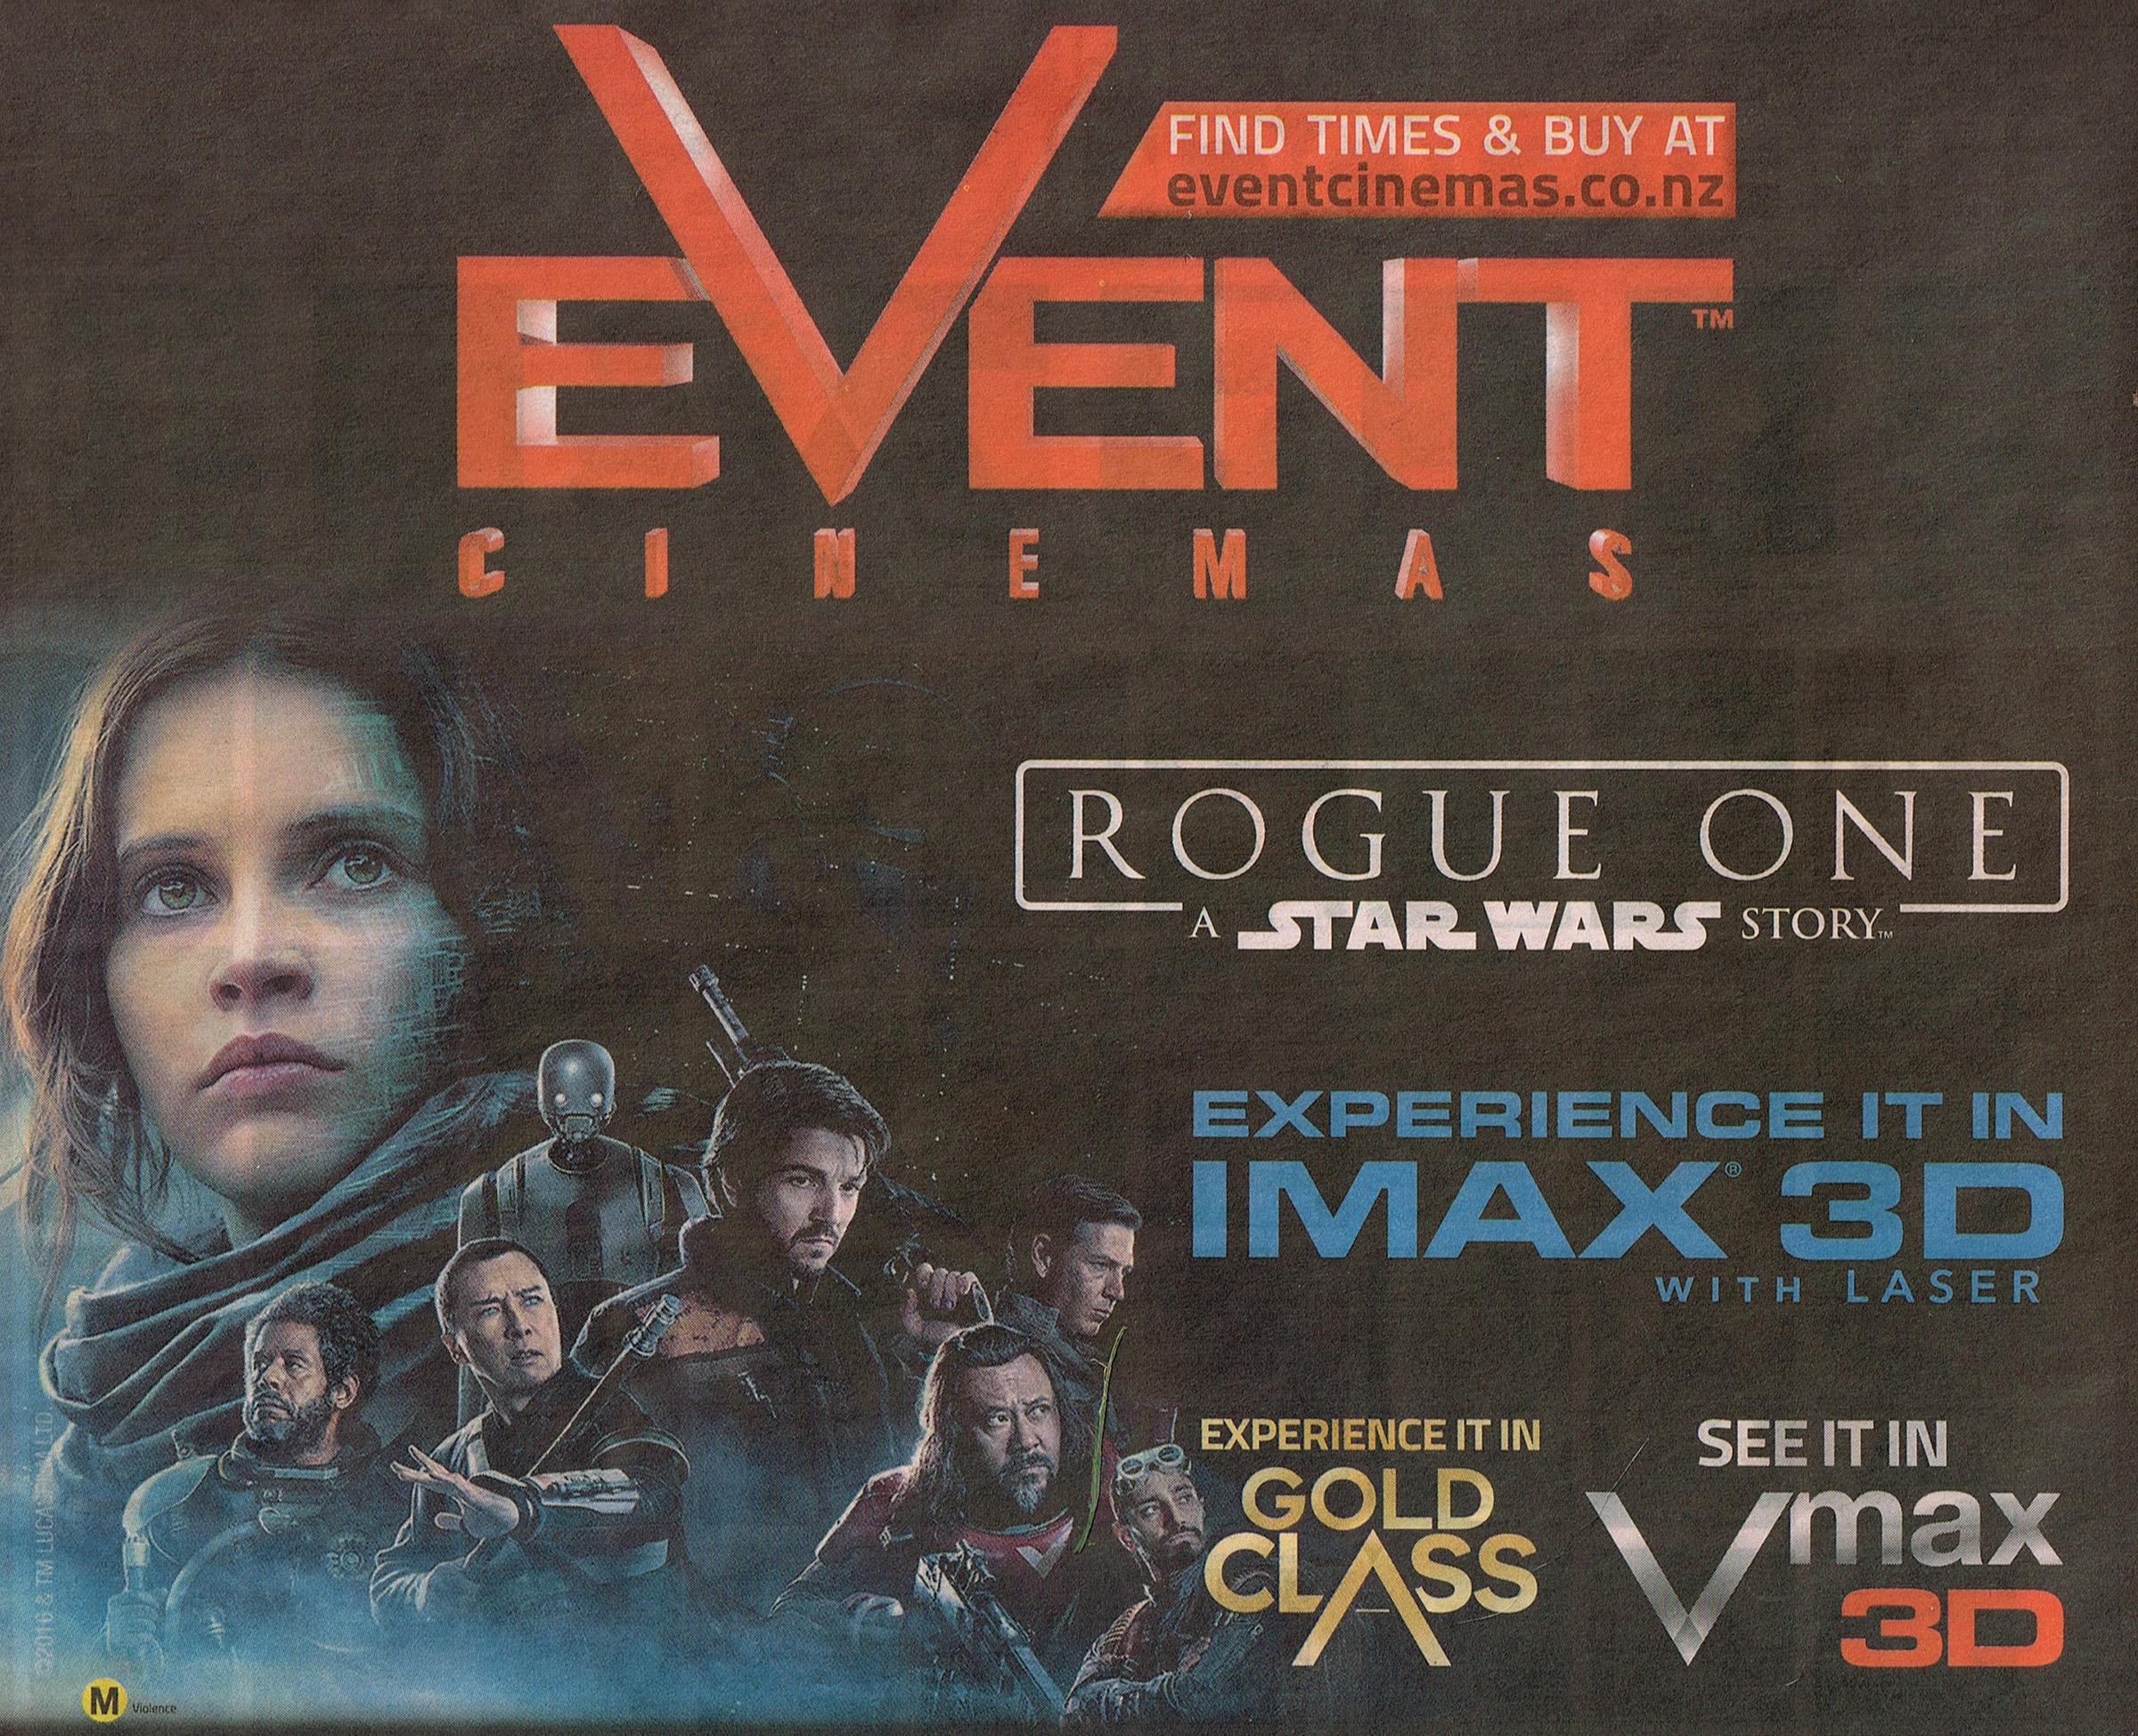 Rogue One, 15 December 2016